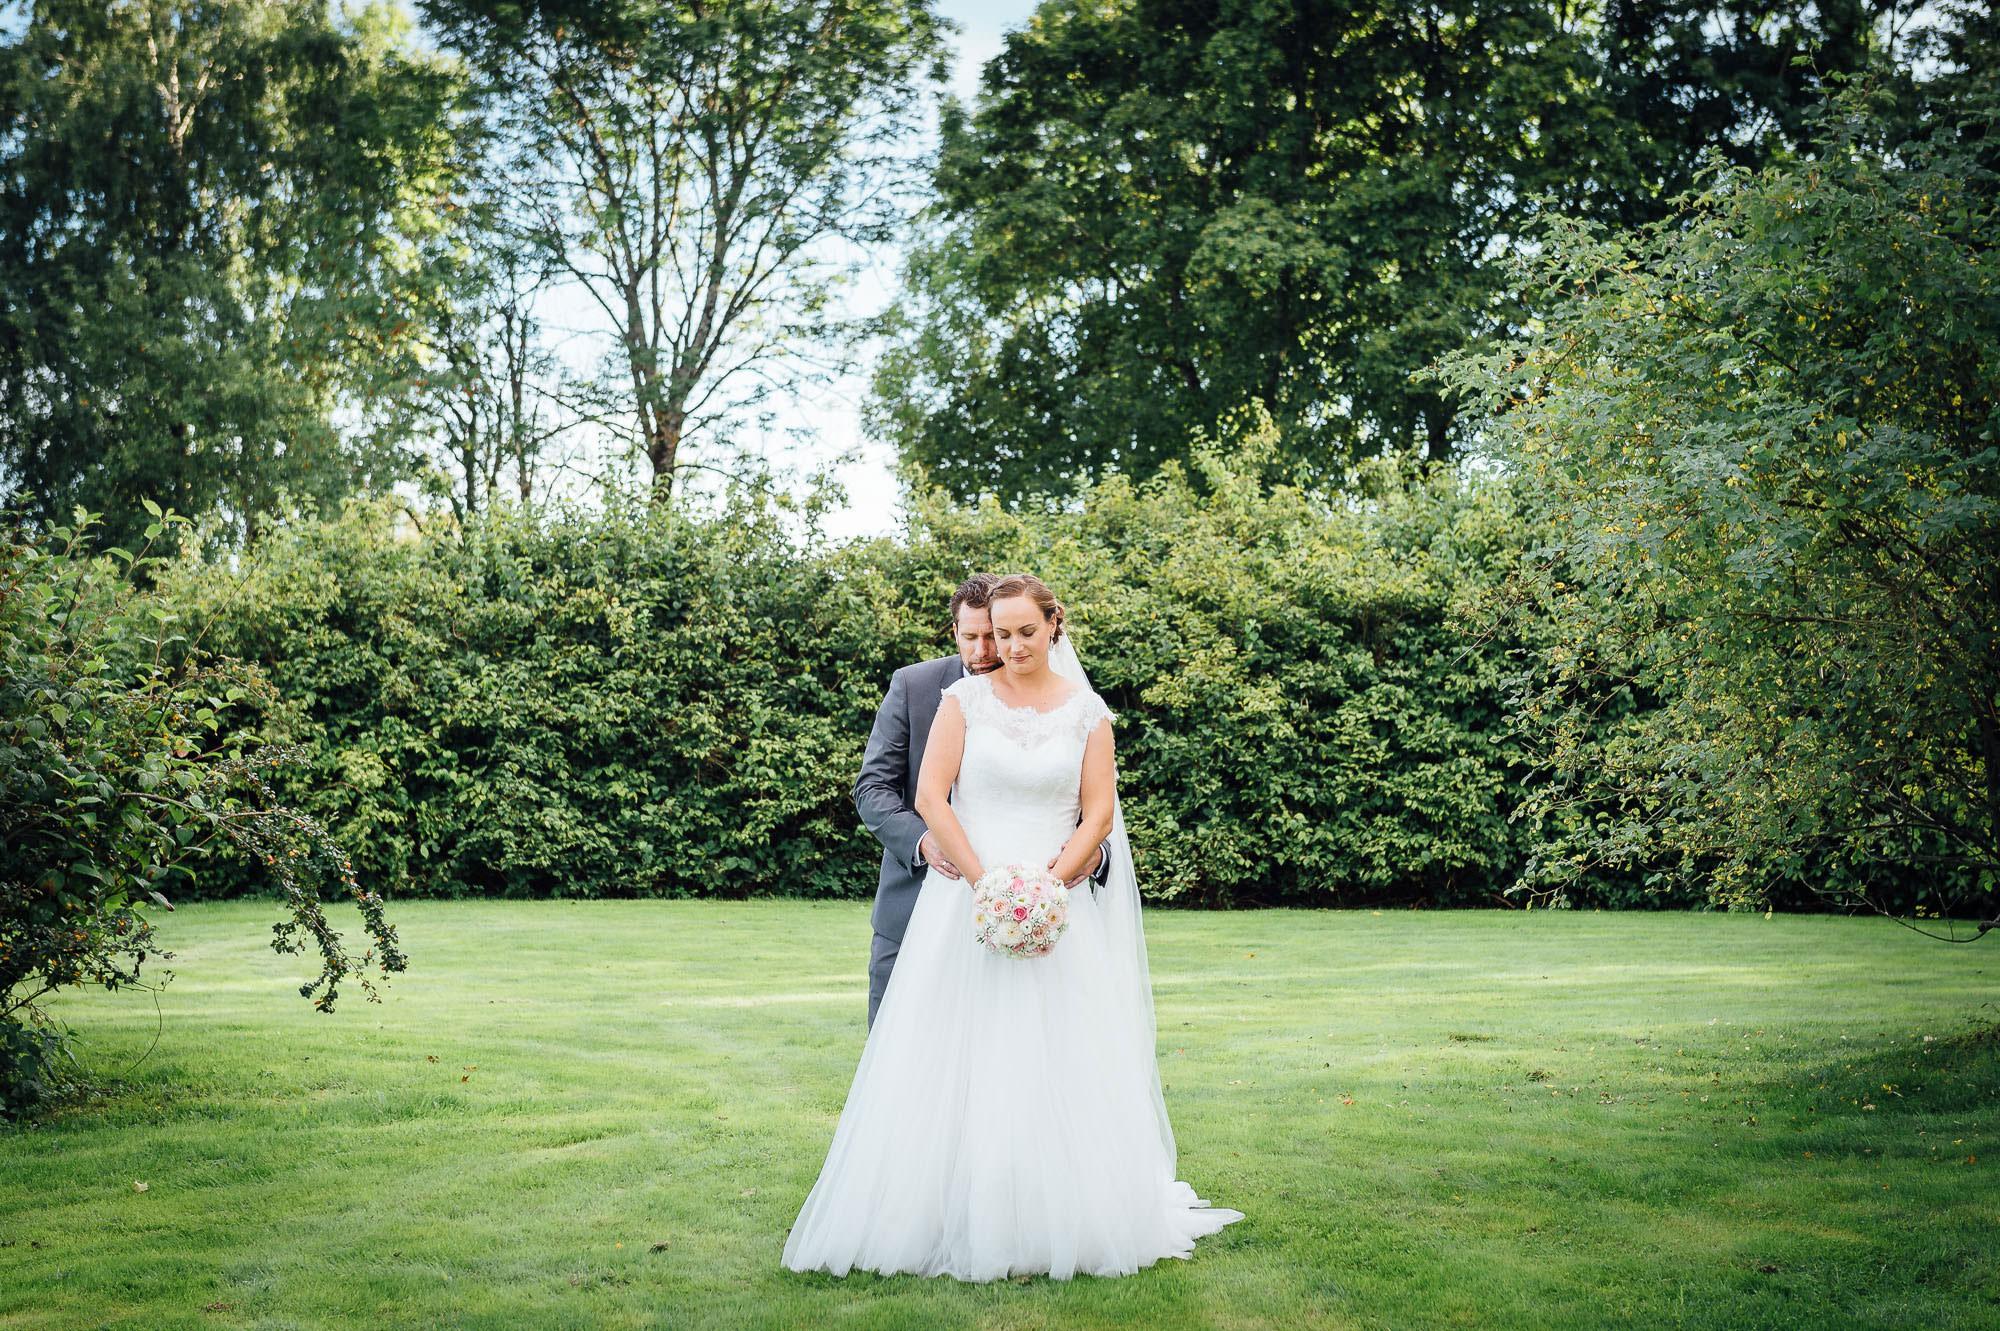 Bryllupsfotograf-Porsgrunn-Skien-Dag-Frogner-9